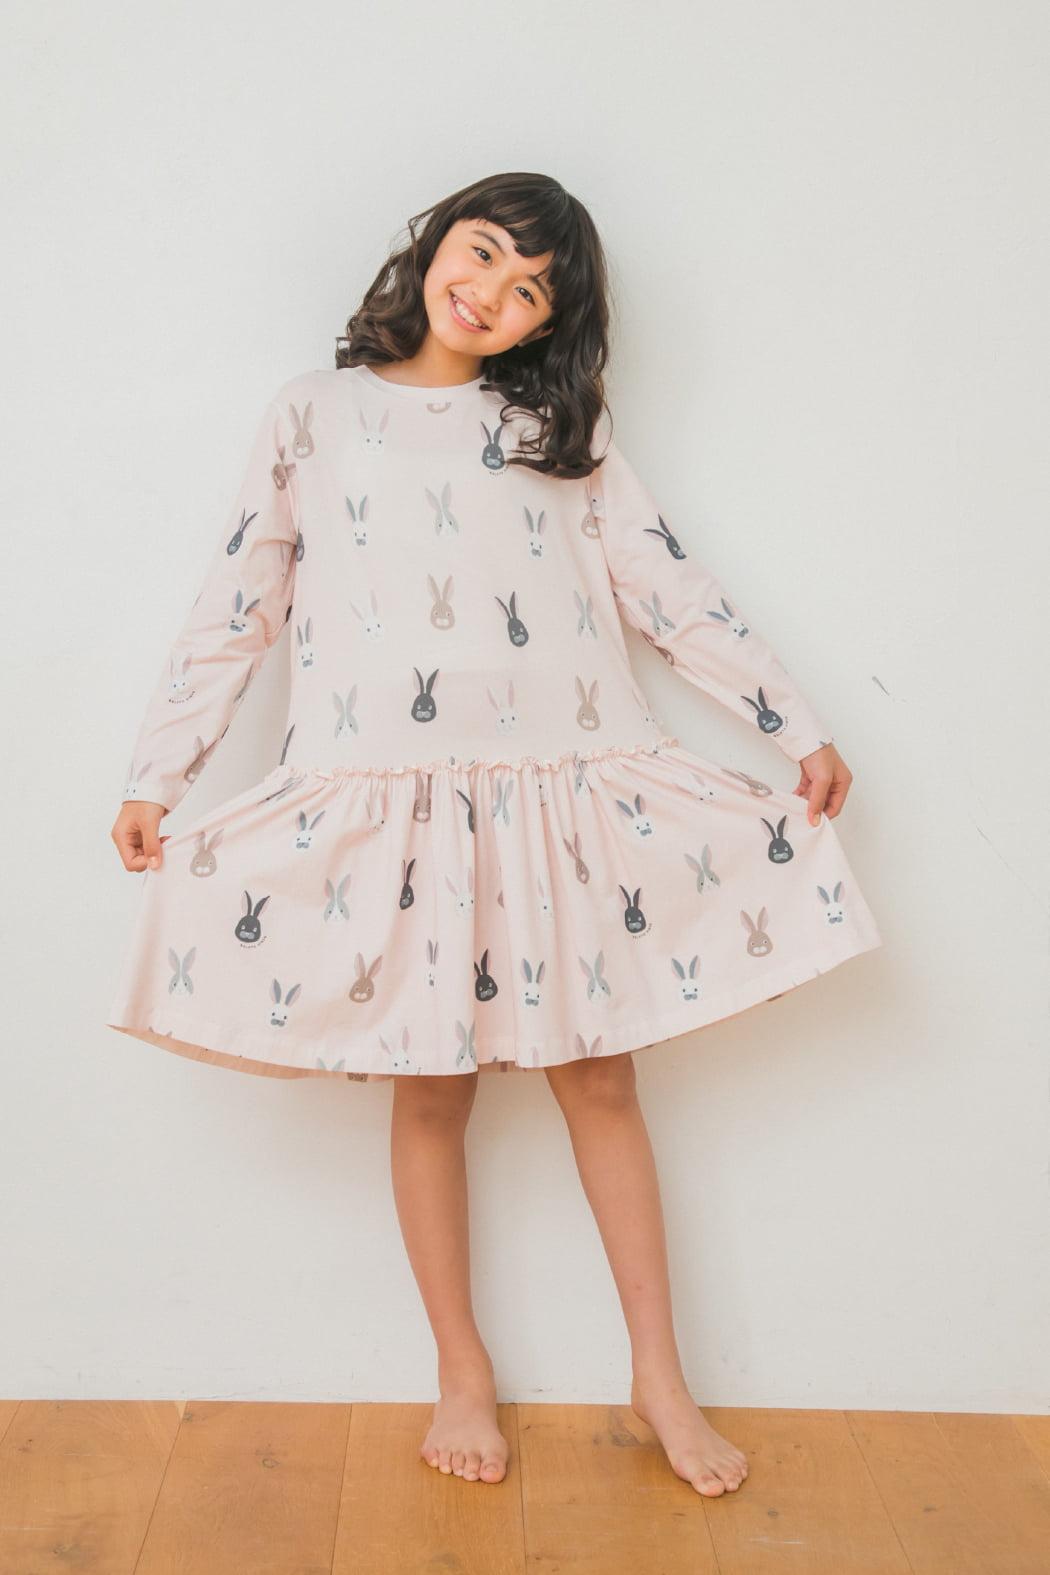 junior うさぎ柄ドレス&レギンスSET